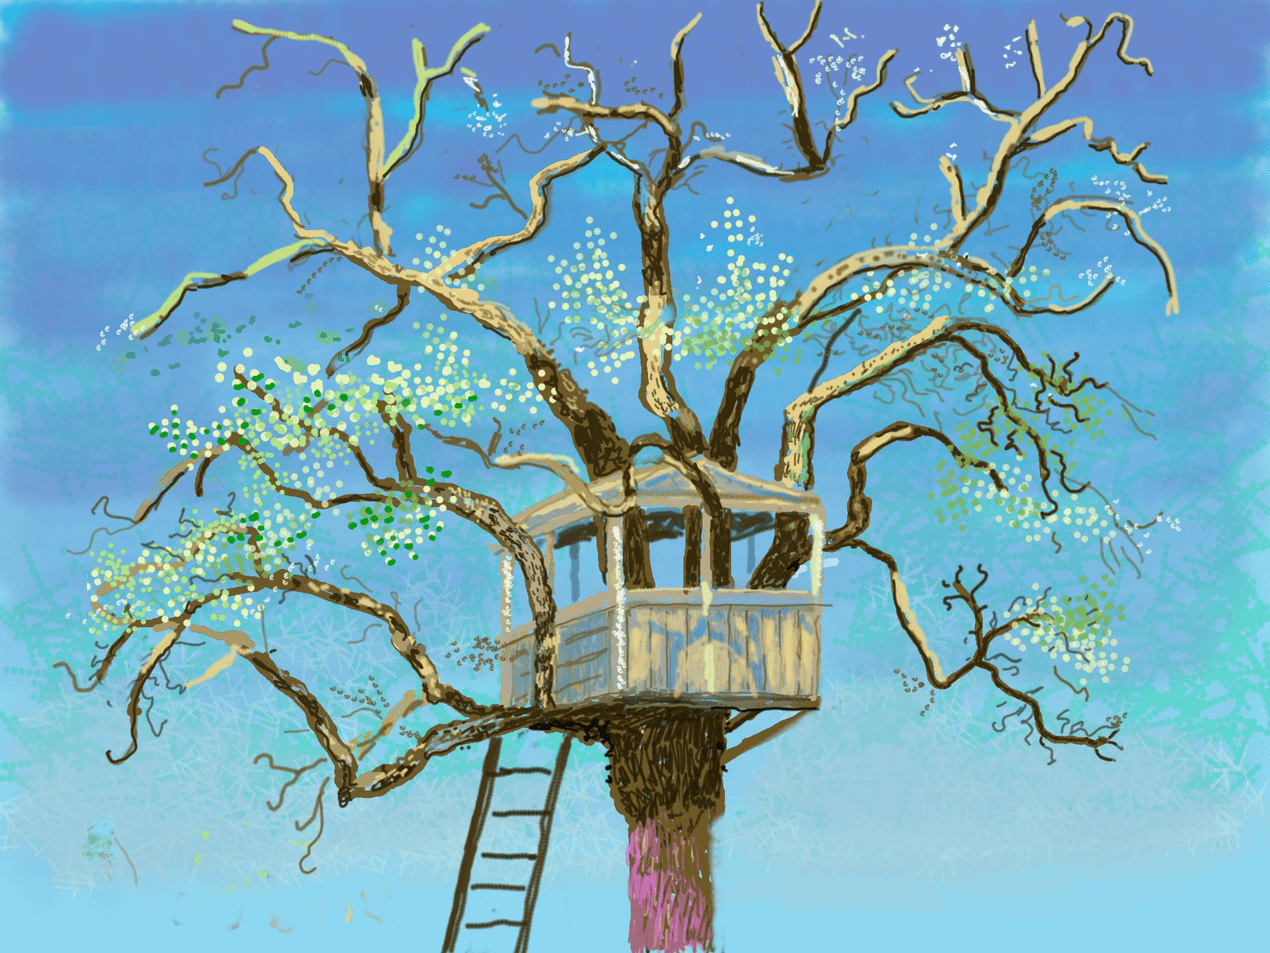 David Hockney's new iPad drawings are a joyful reminder of spring 111488590 painting0125 nc